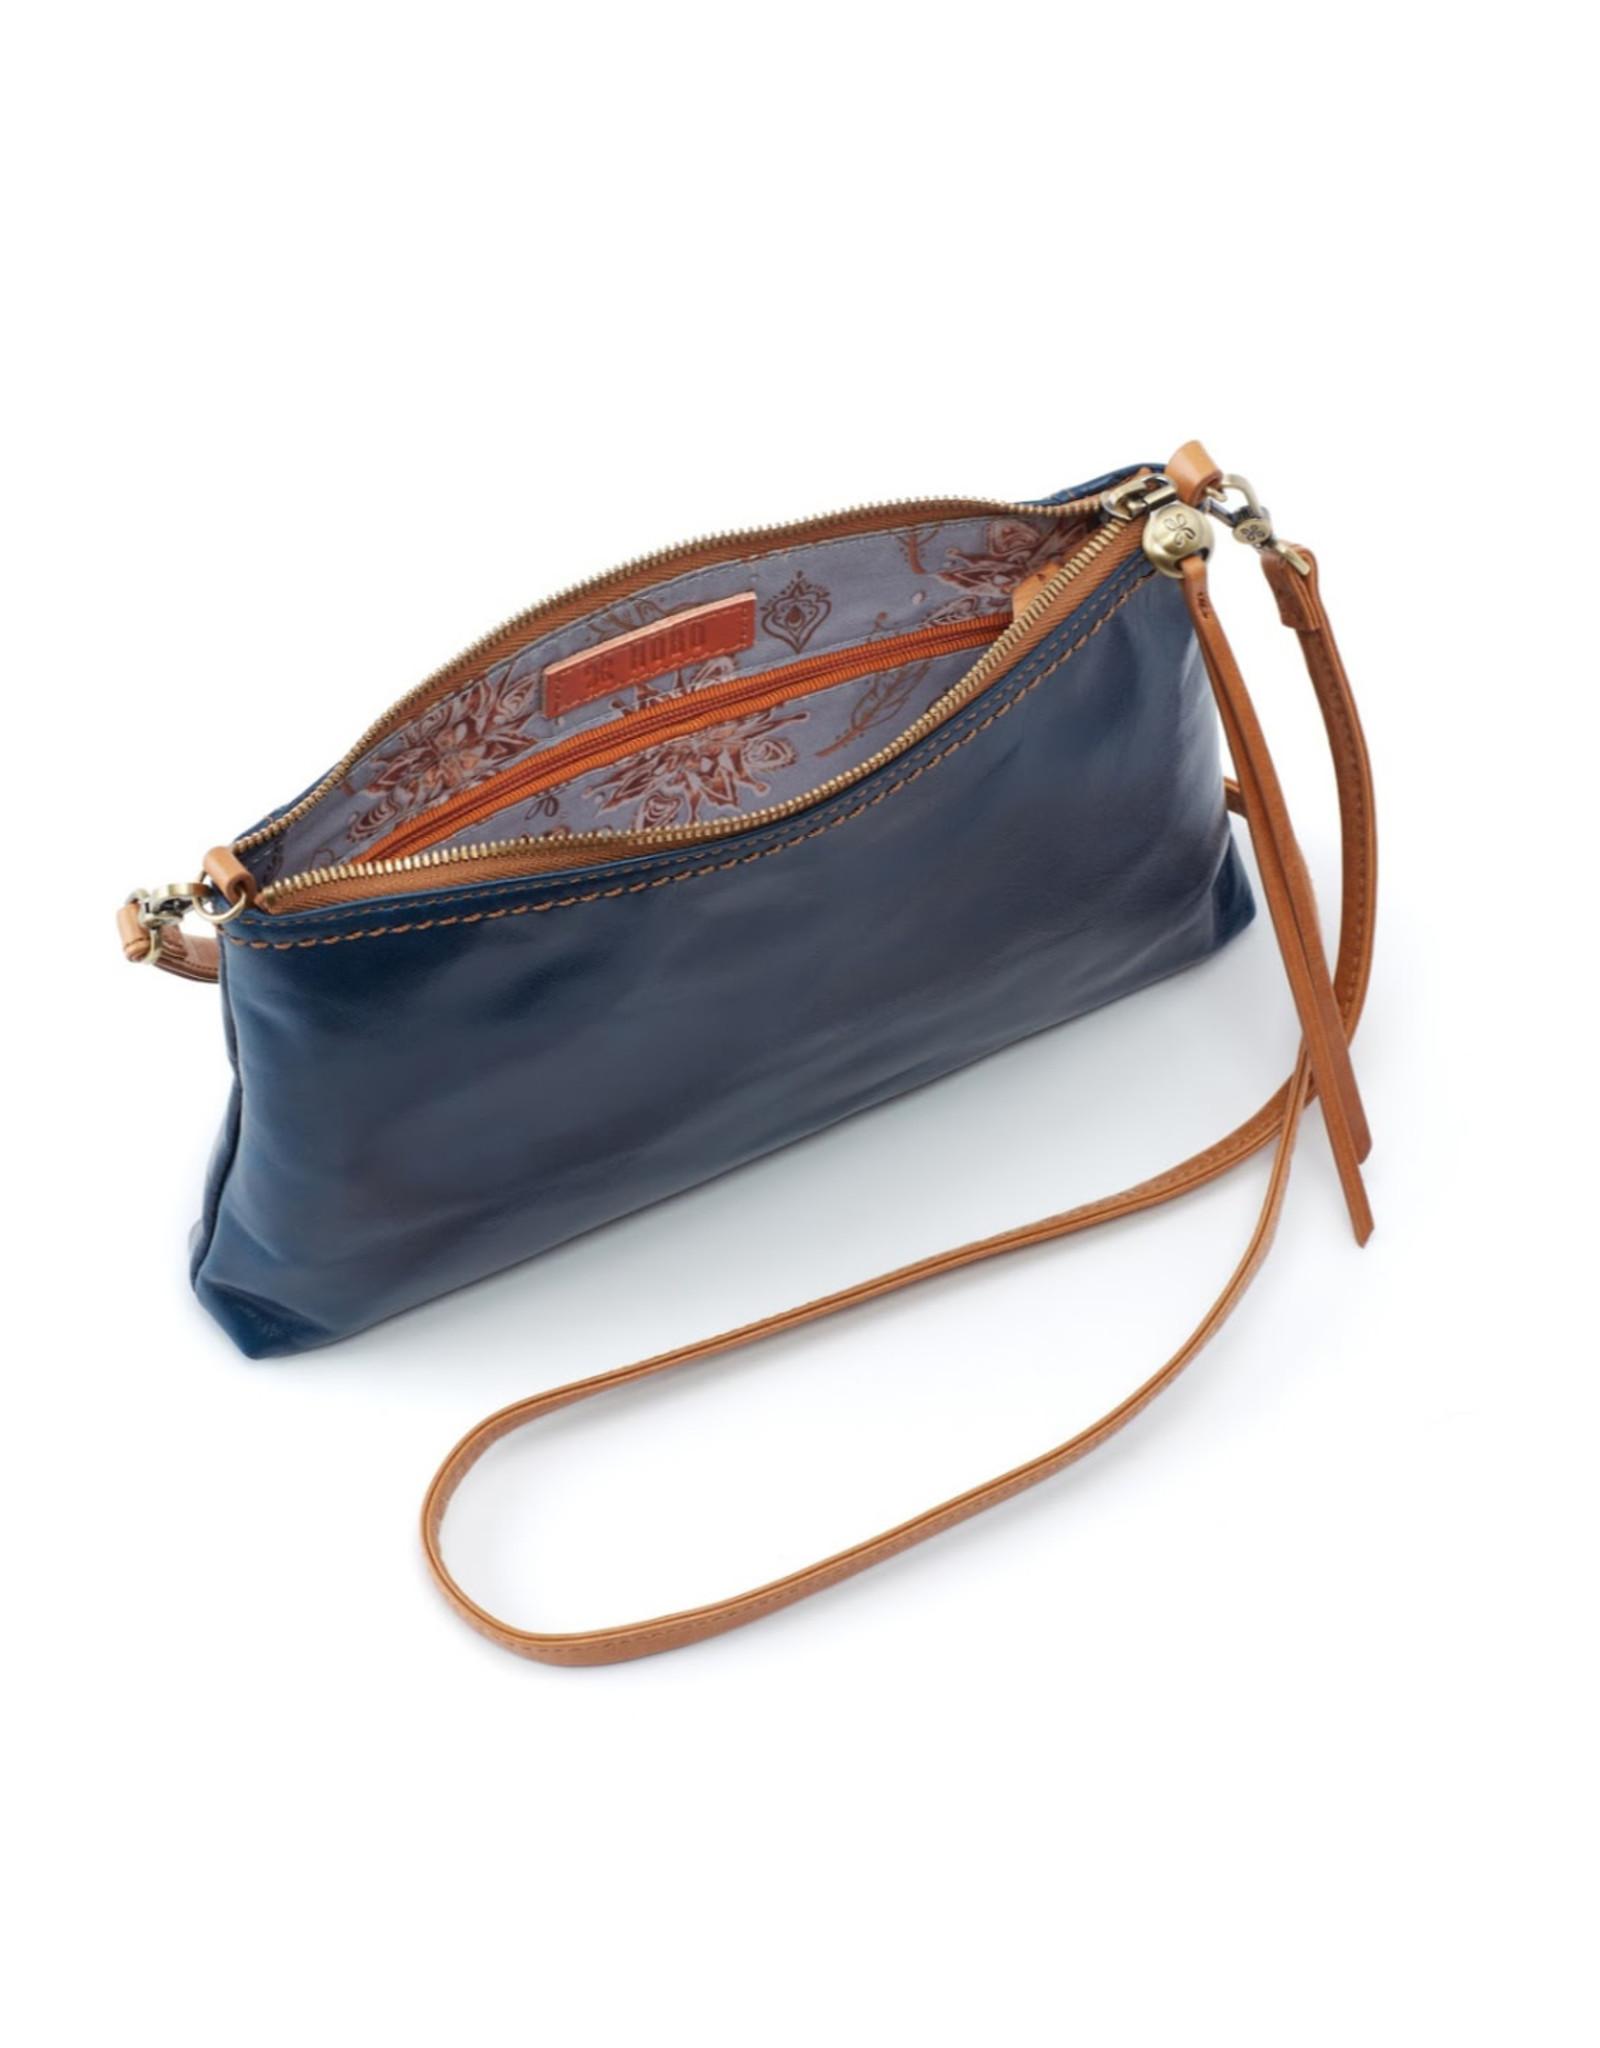 Hobo Darcy Crossbody Bag